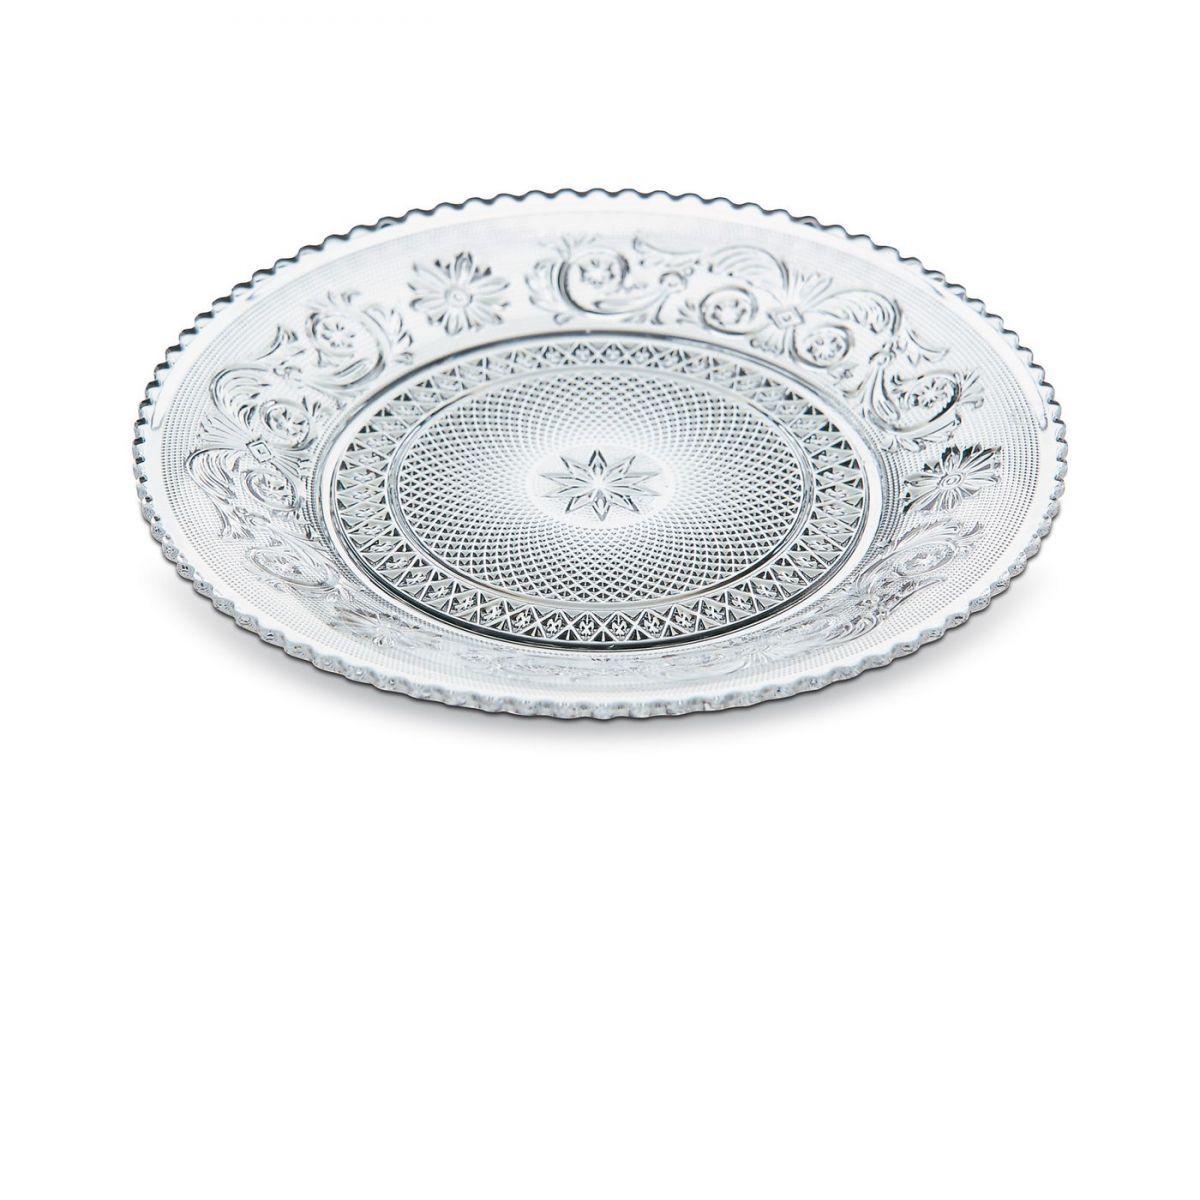 Prato Raso 20cm Arabesque, Baccarat, 1732504